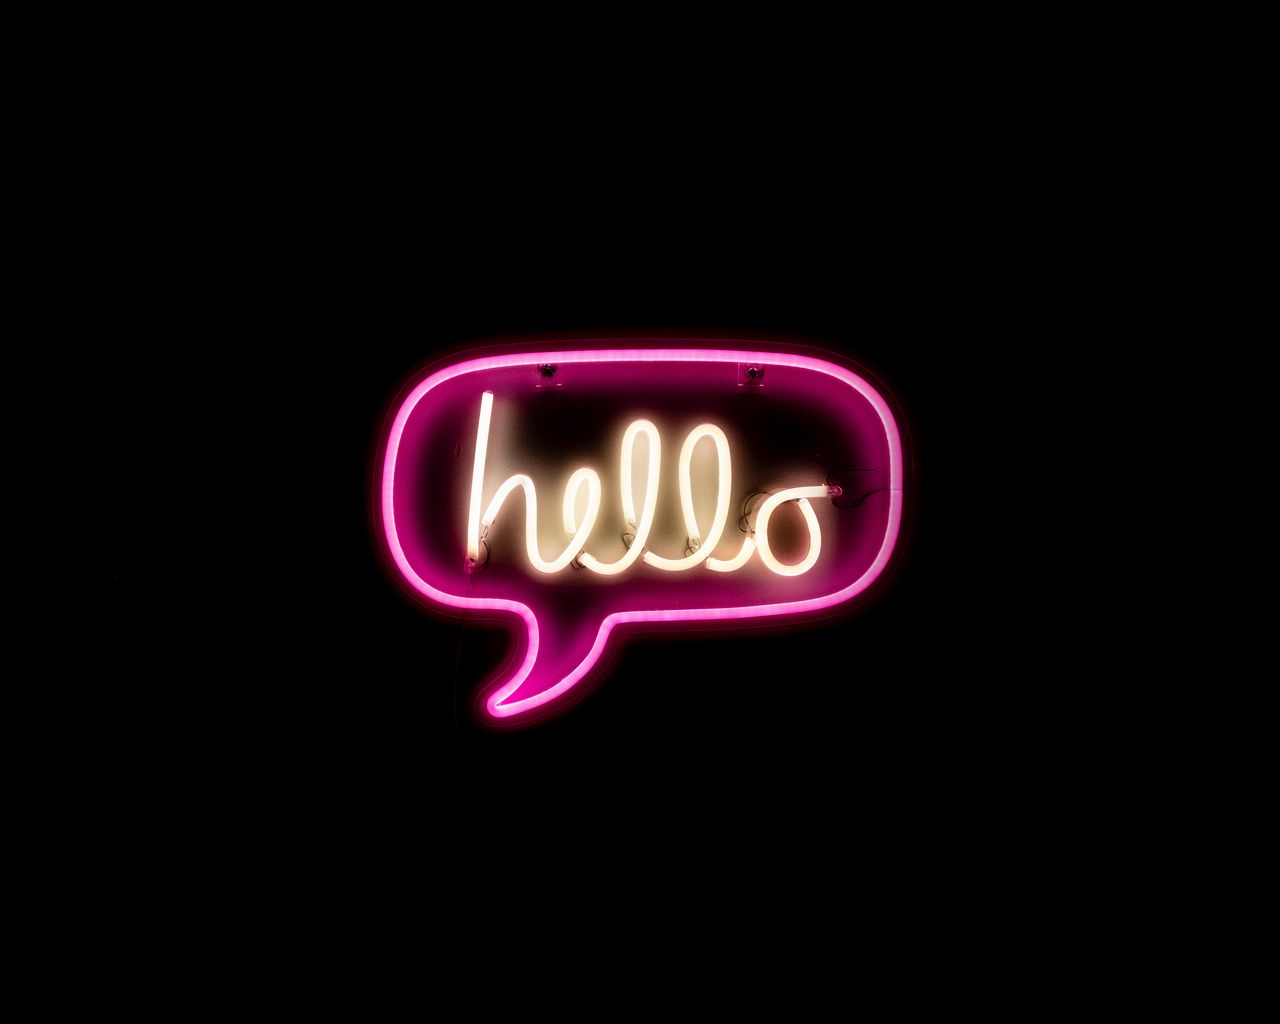 1280x1024 Wallpaper hello, neon, inscription, text